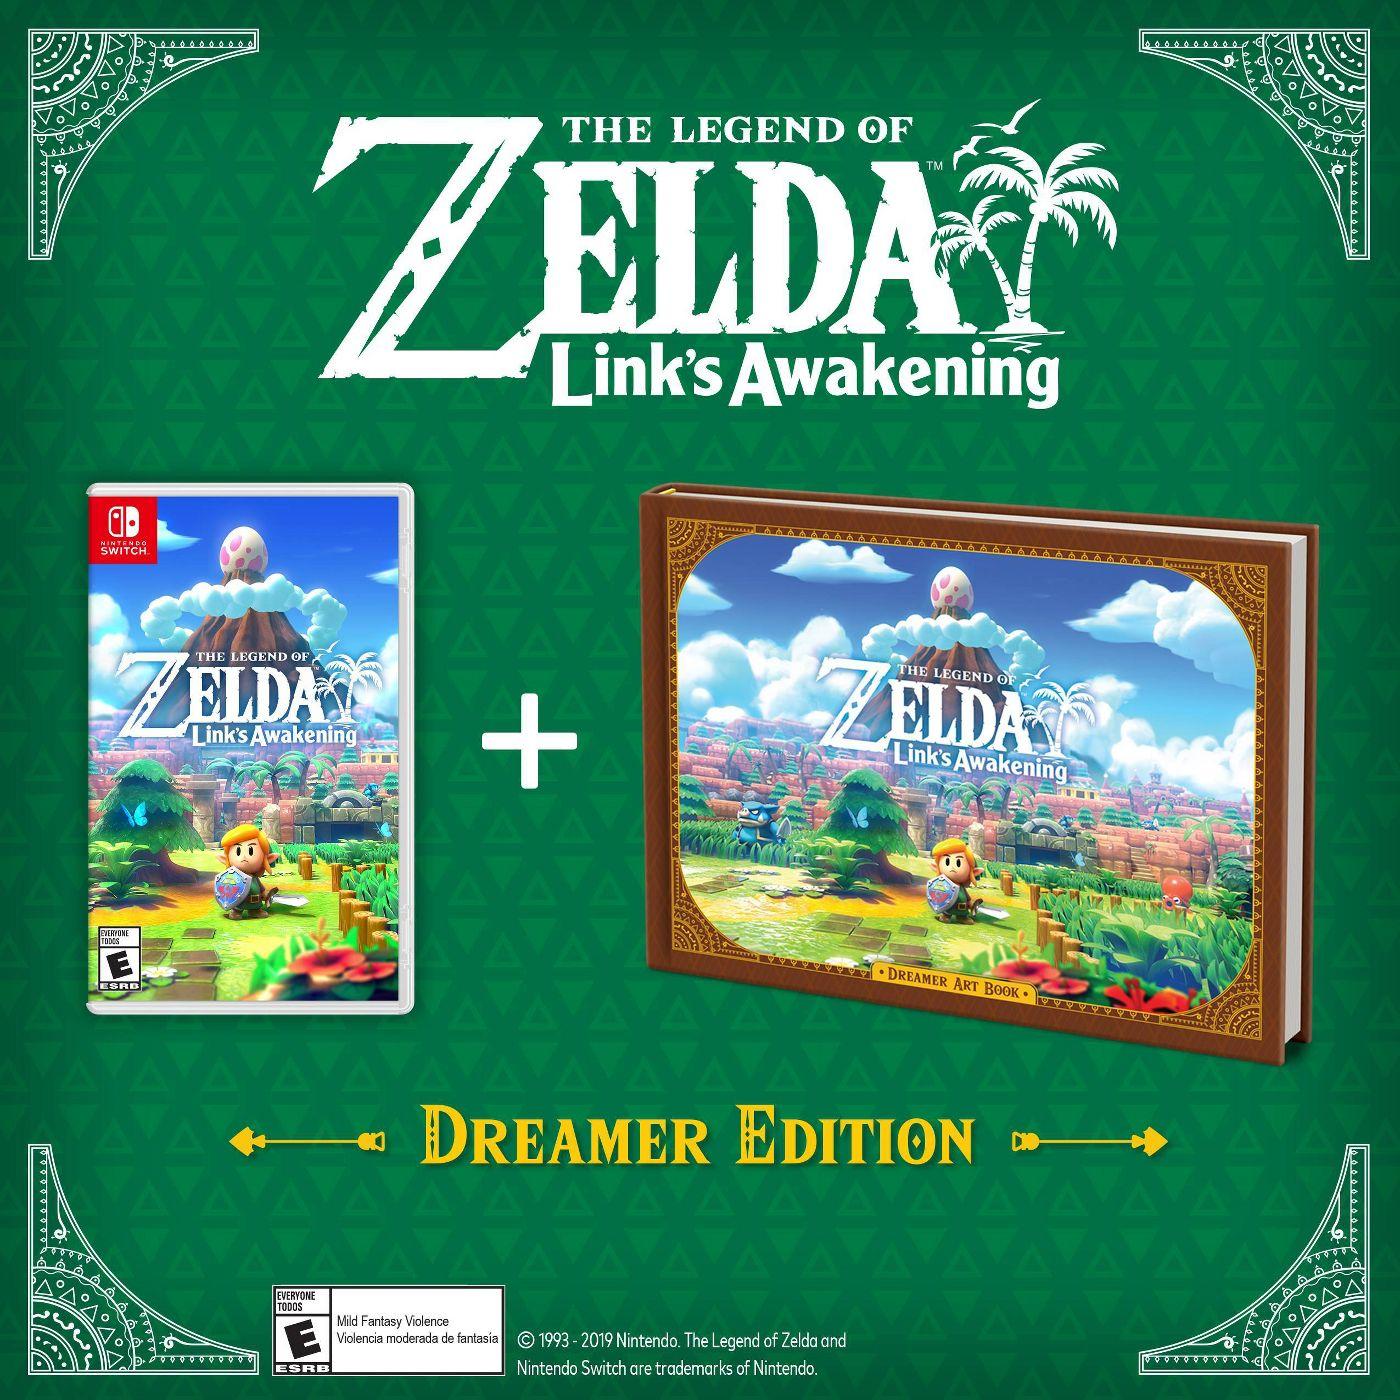 Preorder The Legend of Zelda: Links Awakening, Dreamer Edition or Amiibo from Target $69.99